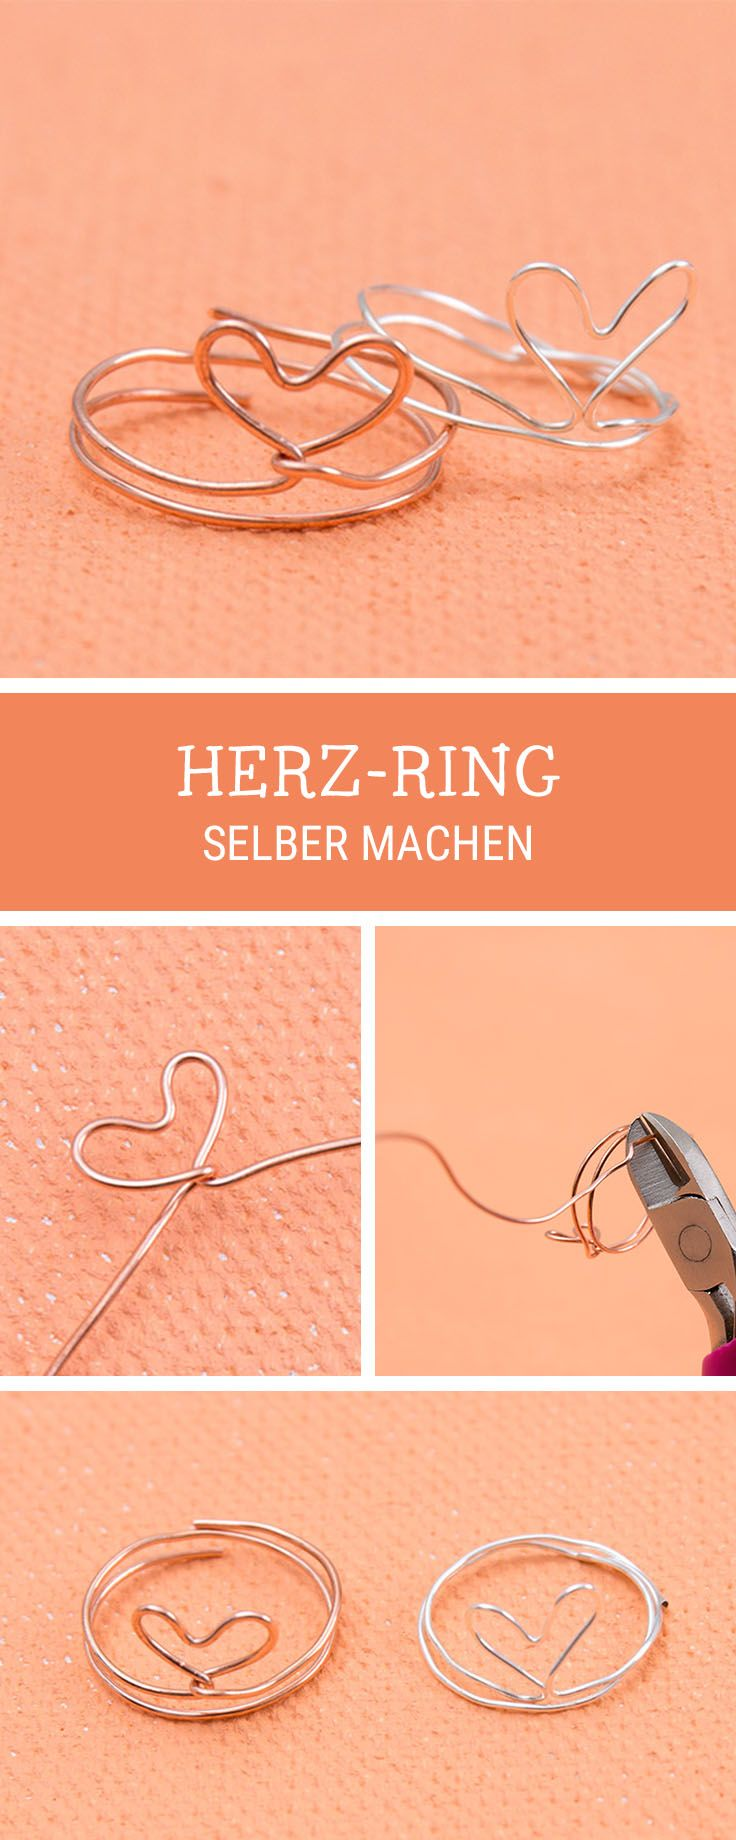 DIY-Anleitung: Herz-Ring aus Metall selber machen via DaWanda.com ...